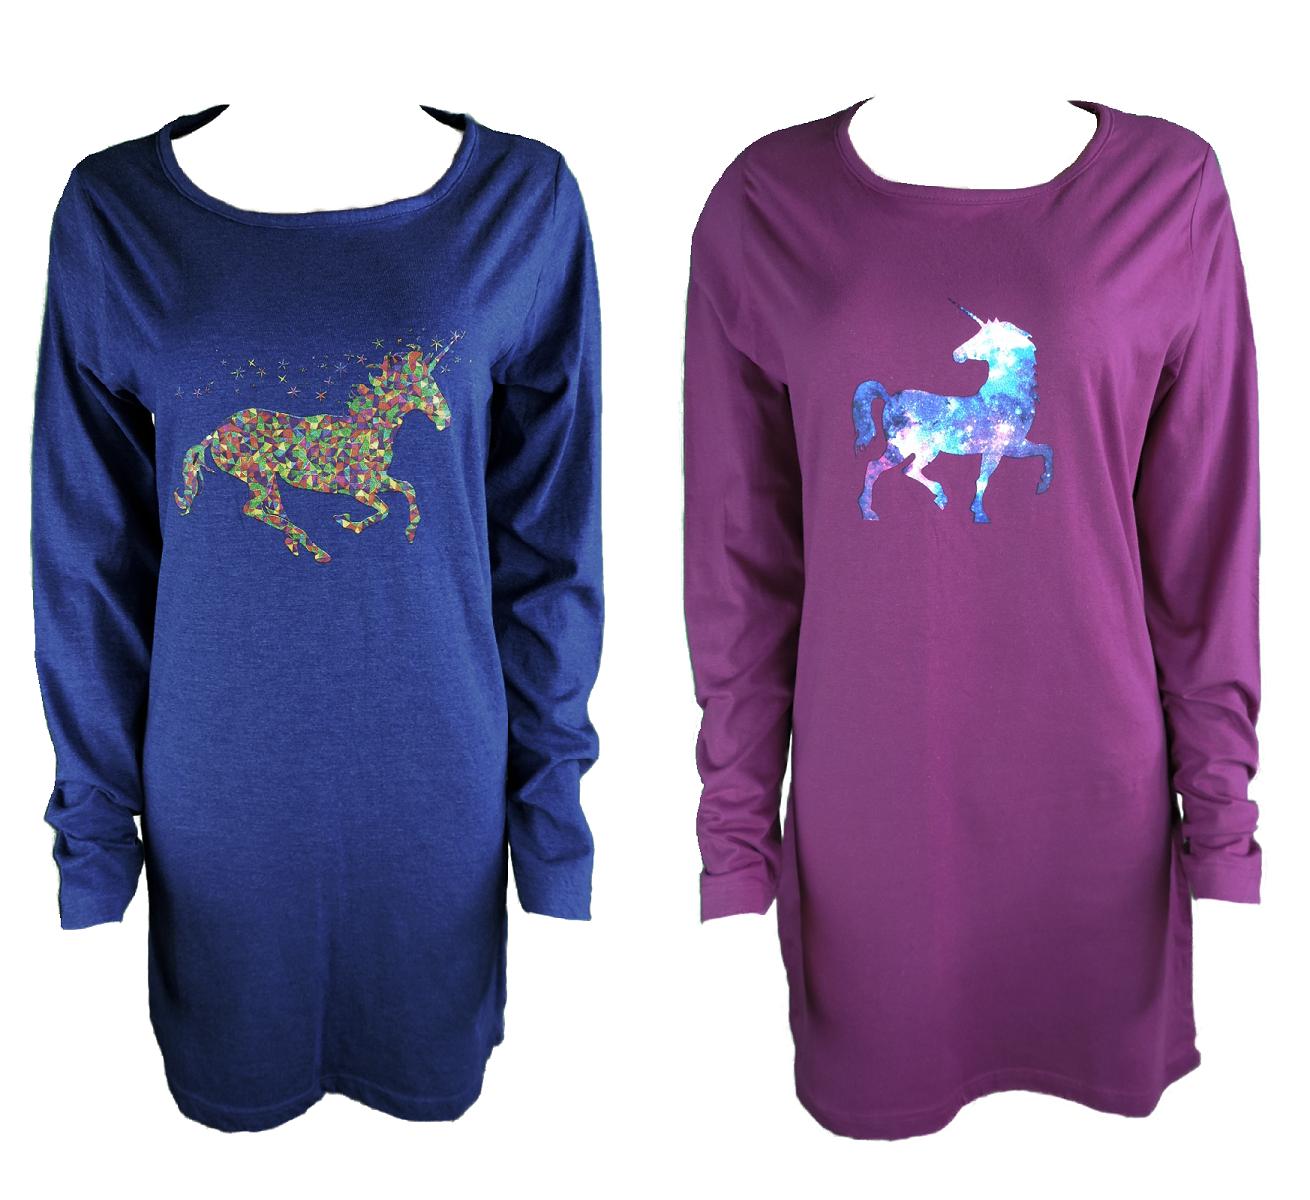 Damen Nachthemd Sleepshirt Langarm Blau Lila Baumwolle Gr. S M L XL